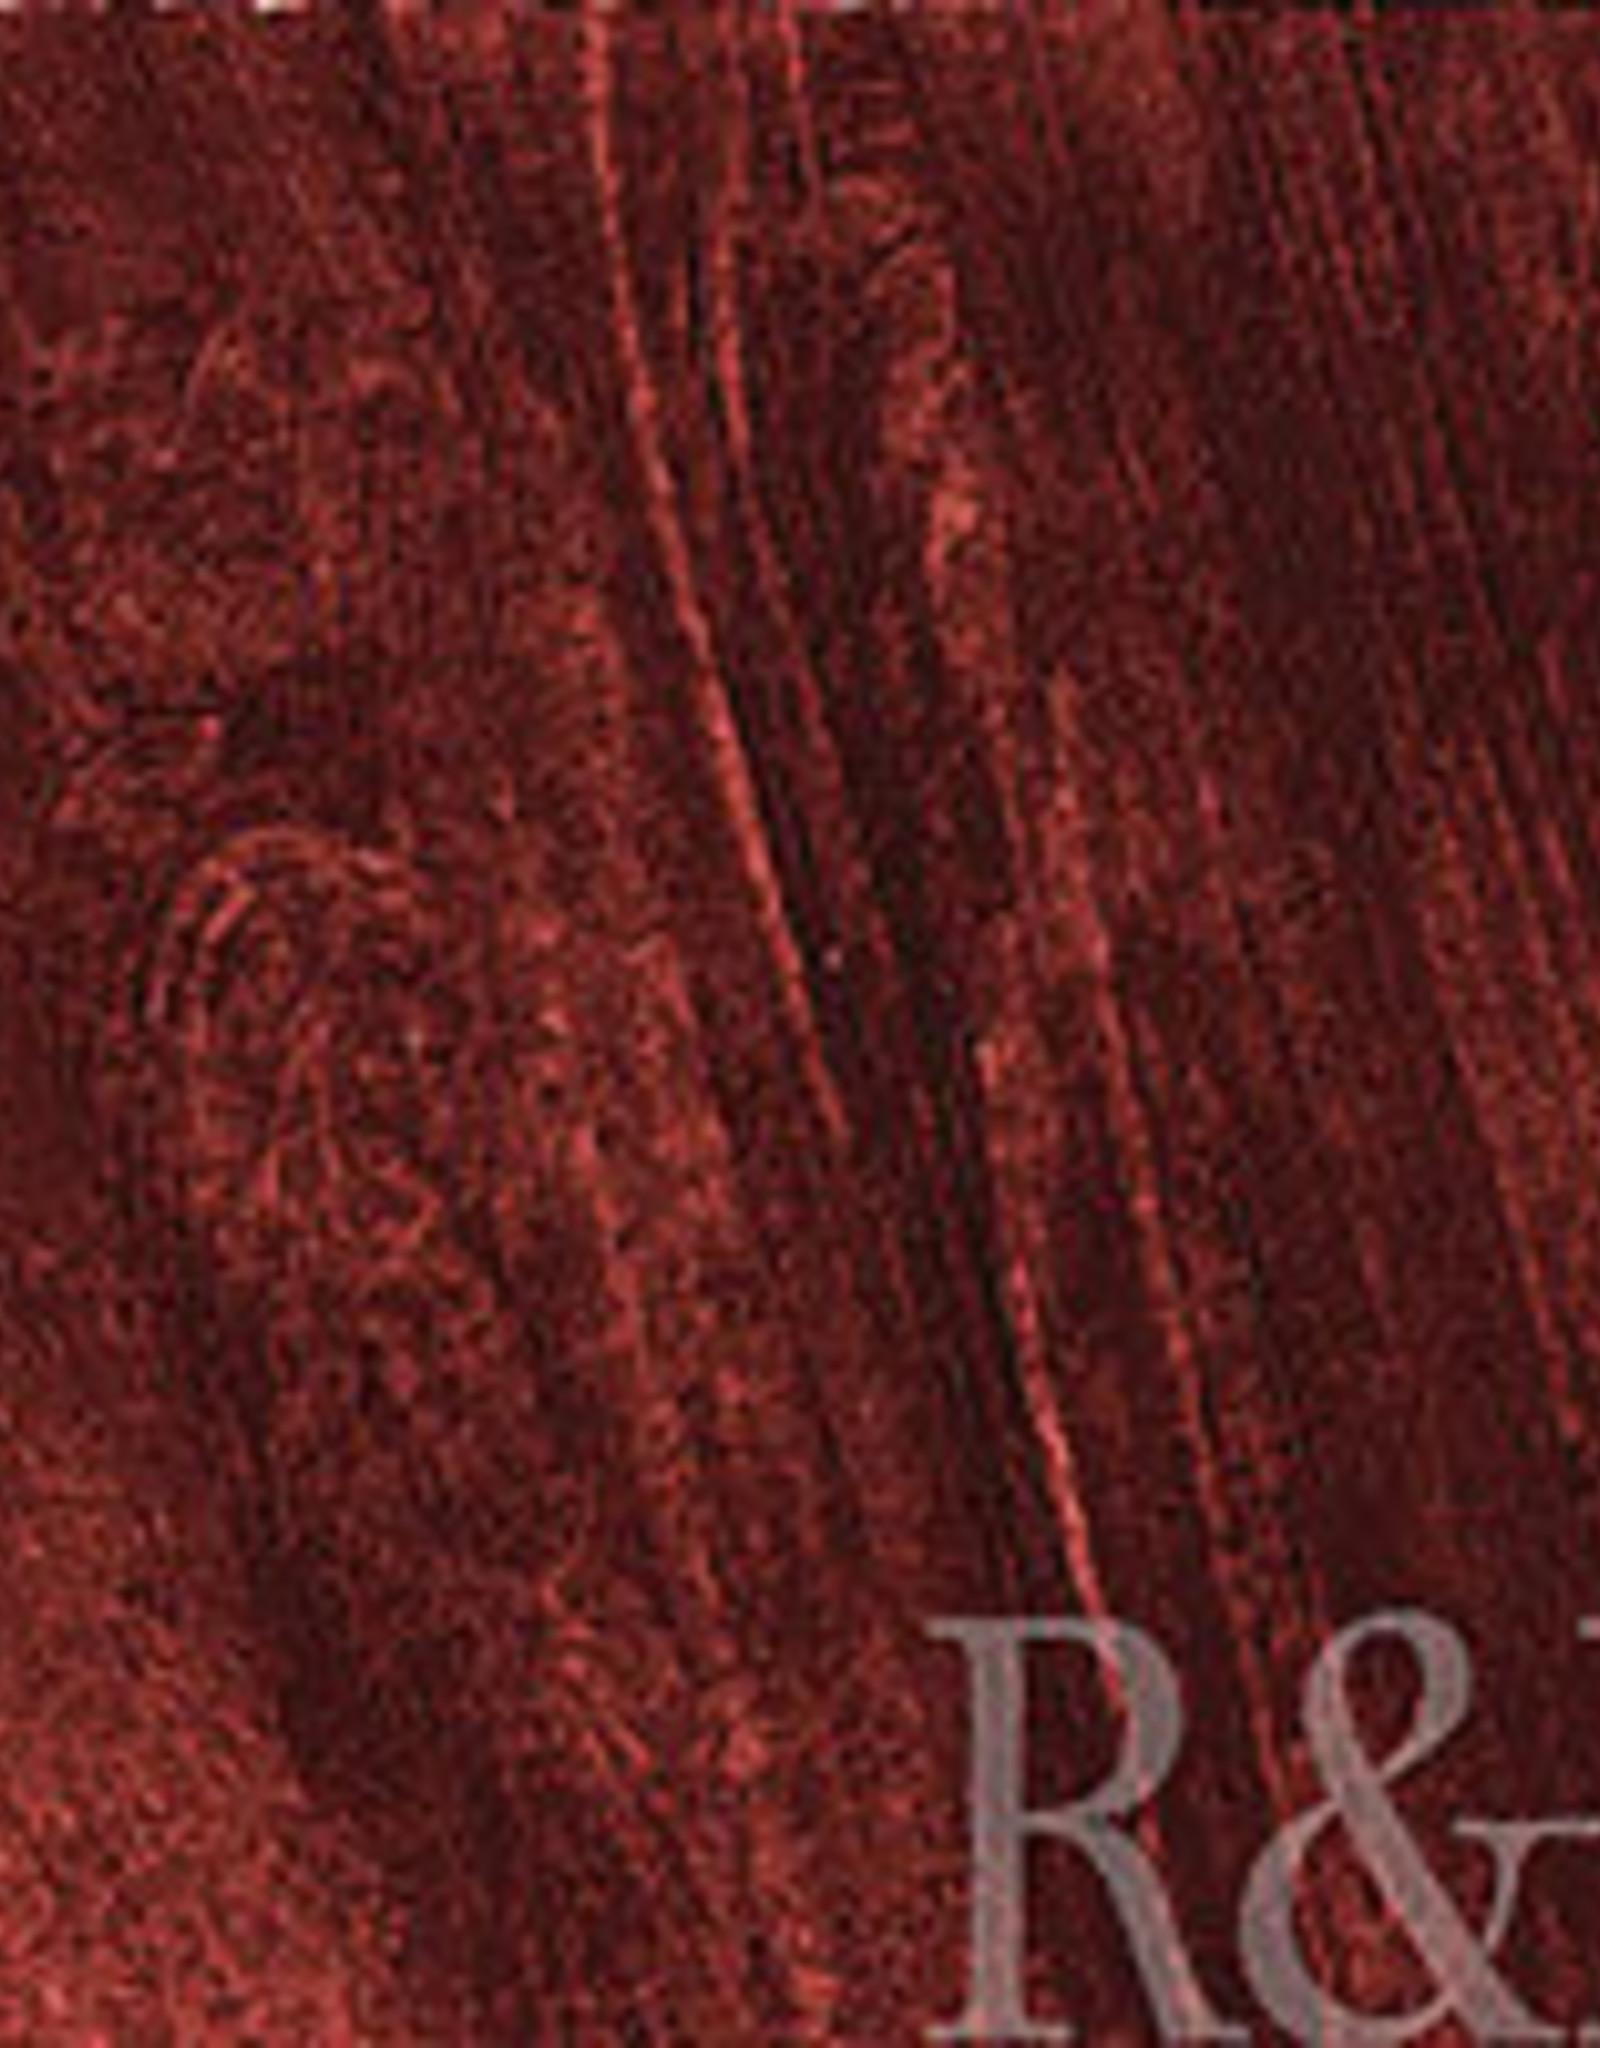 R&F Handmade Paints Encaustic Pigment Stick Sang Earth DP